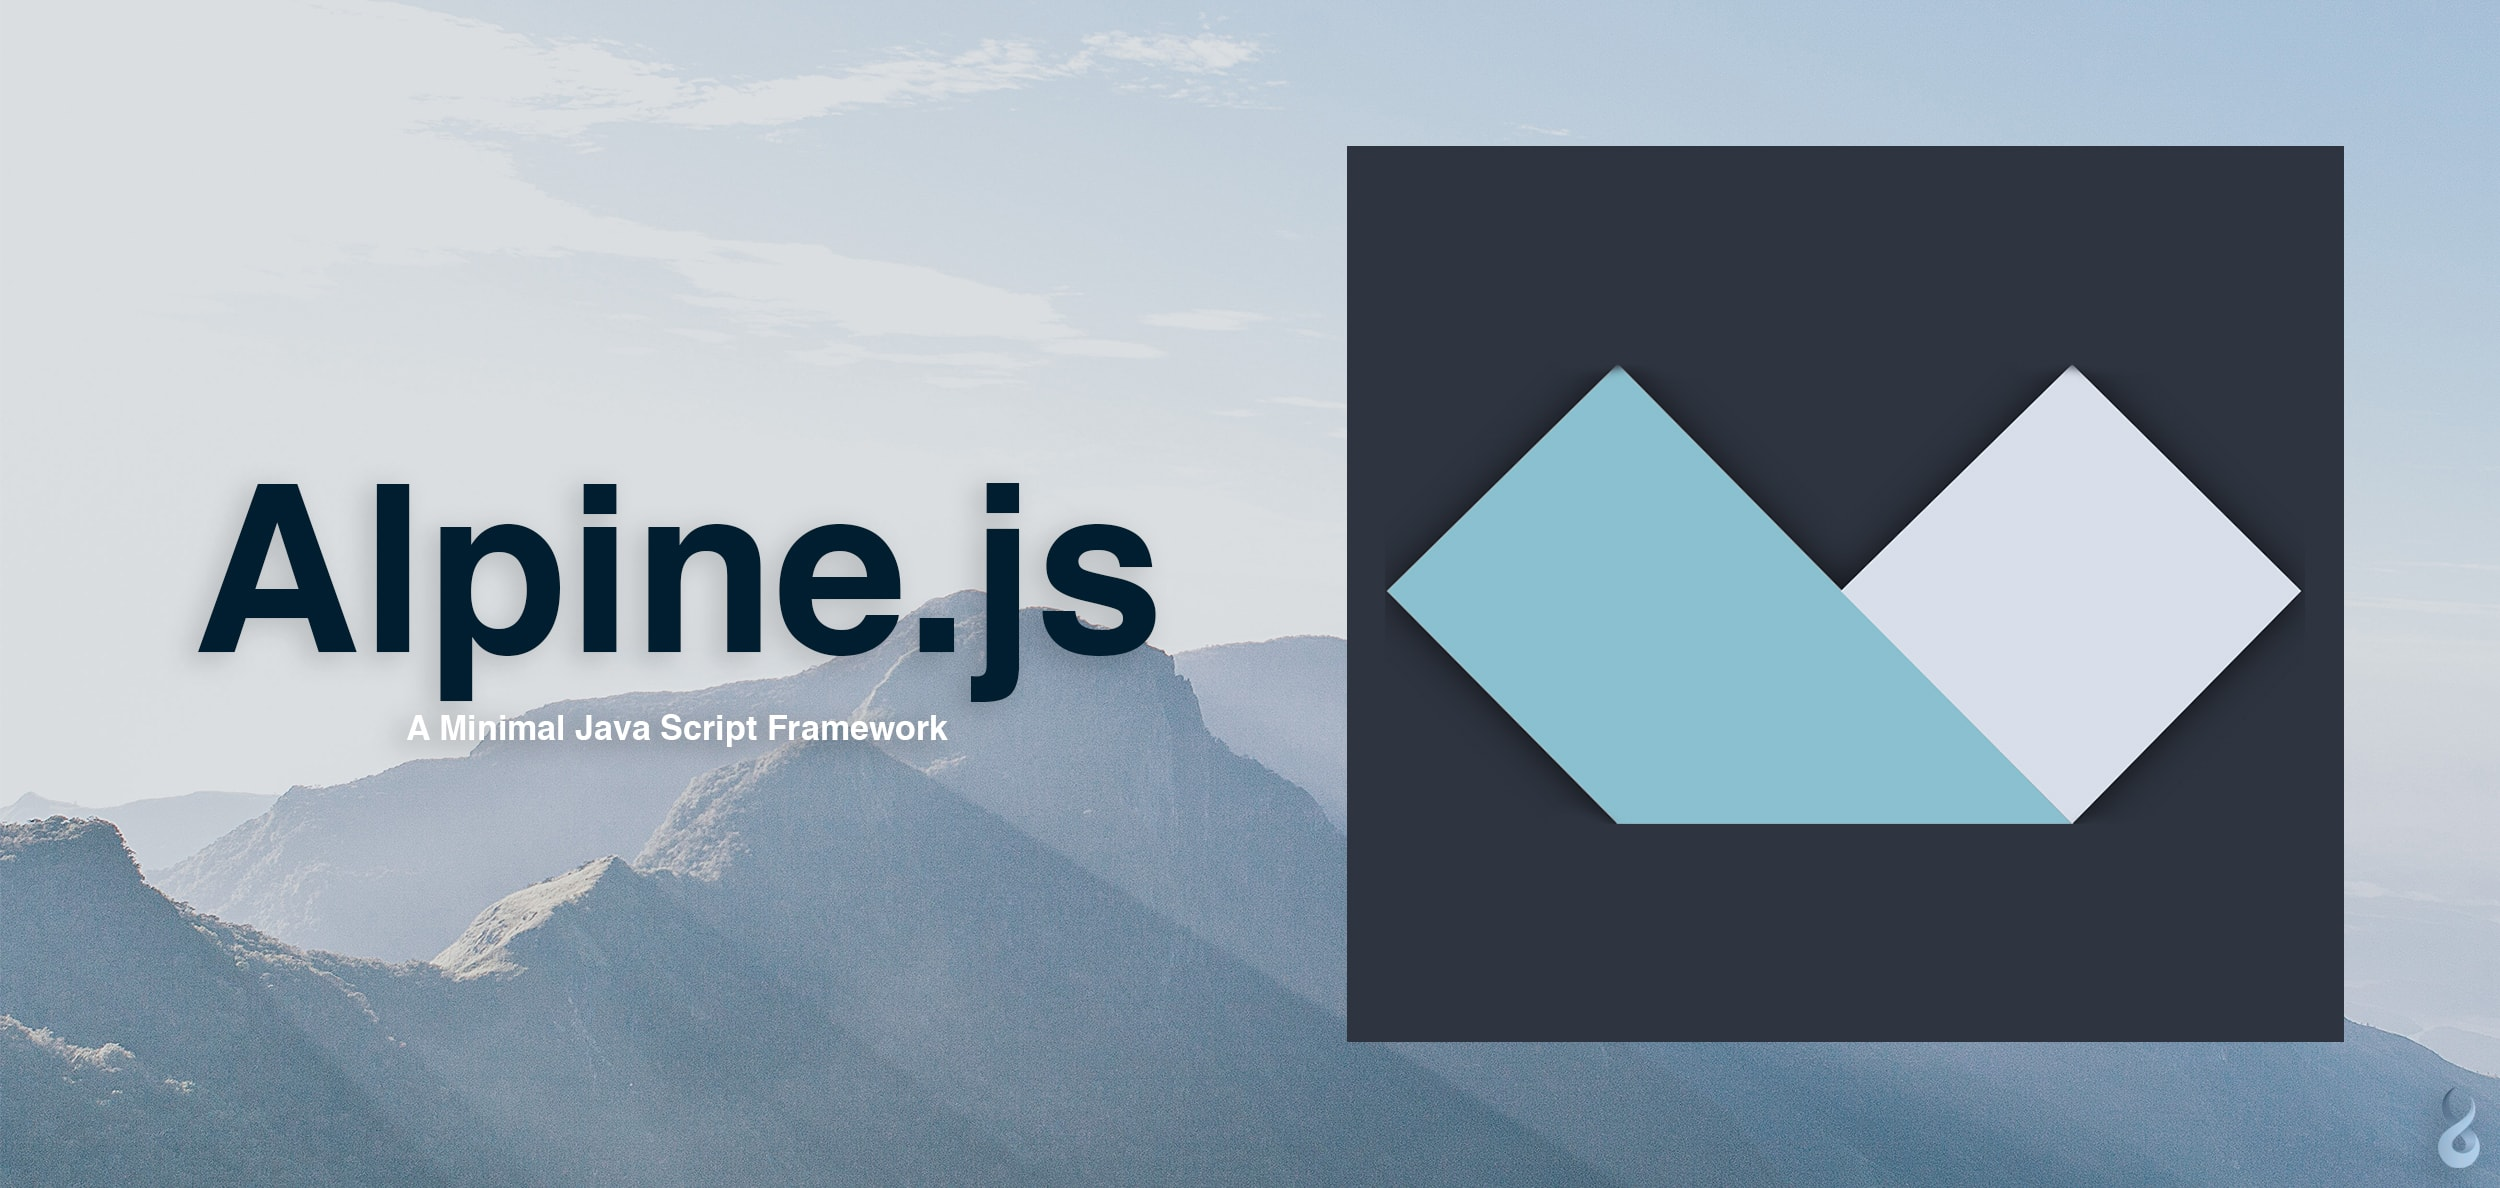 Introducing Alpine.js | A Minimal JavaScript Framework | Raidan.com.au